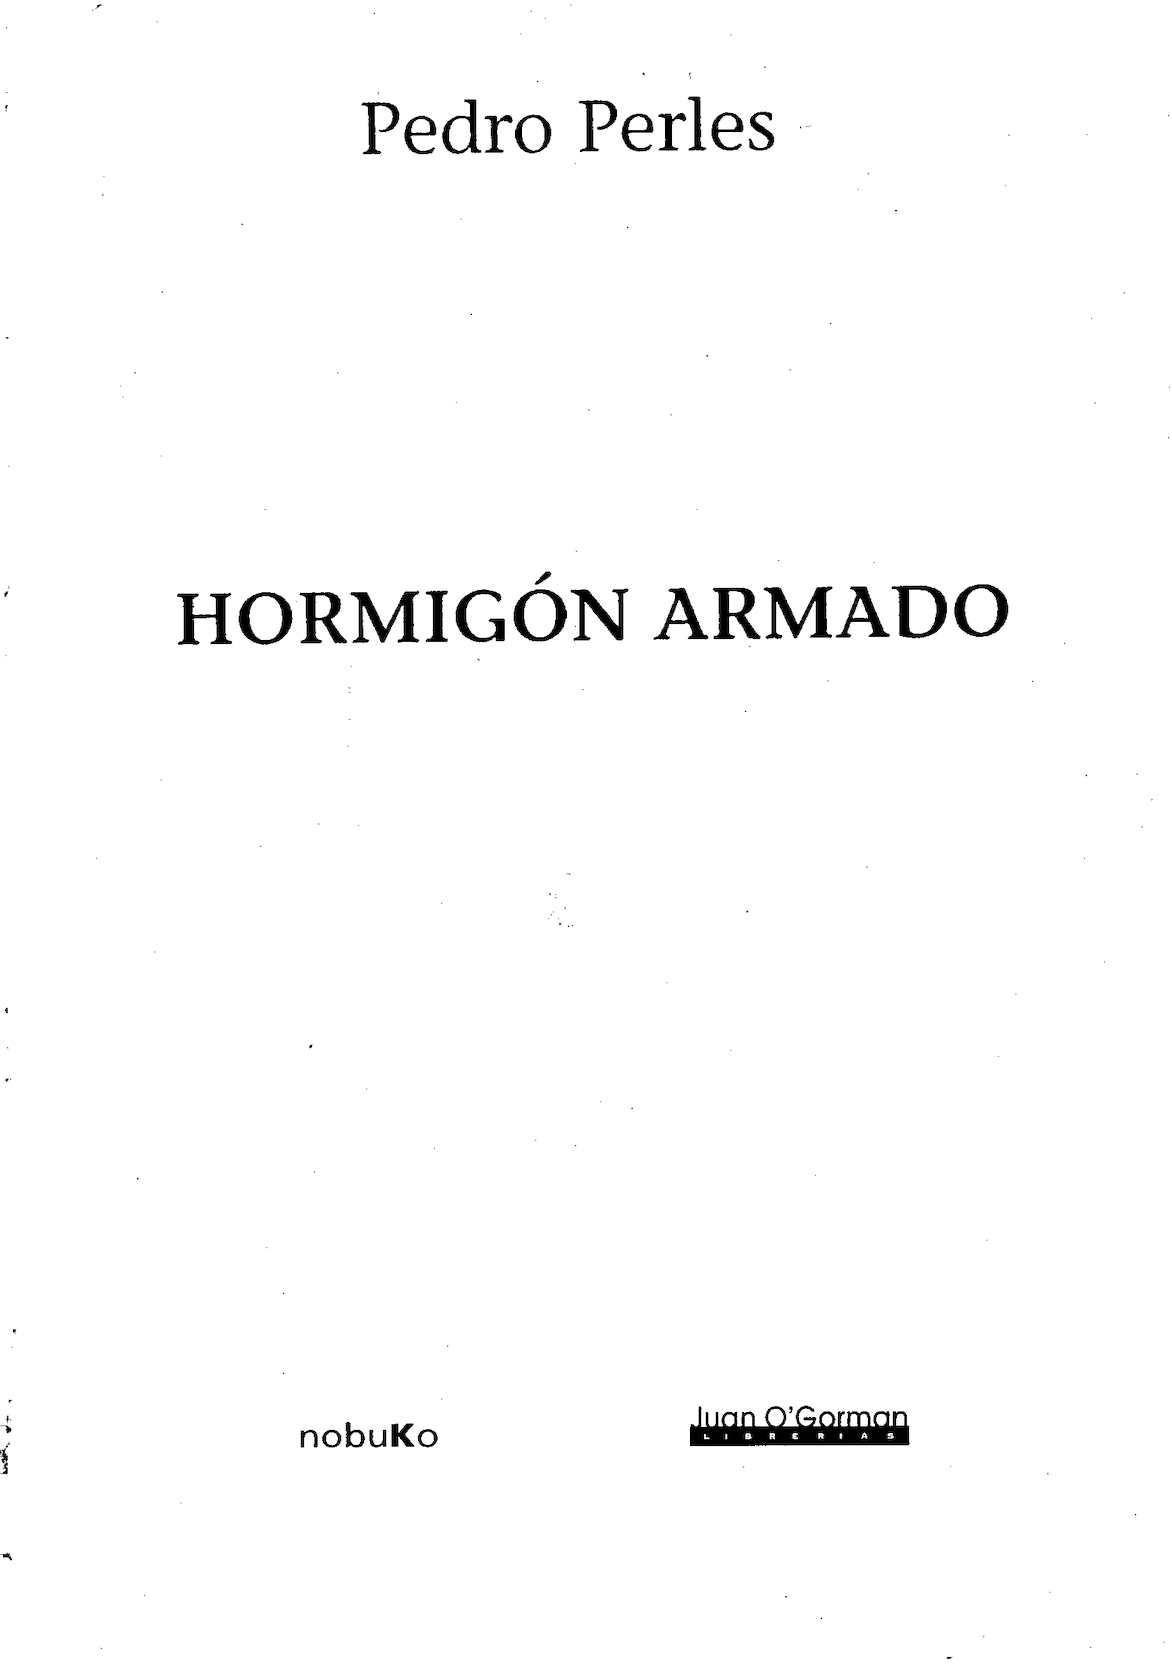 Calaméo - Hormigón Armado; Pedro Perles